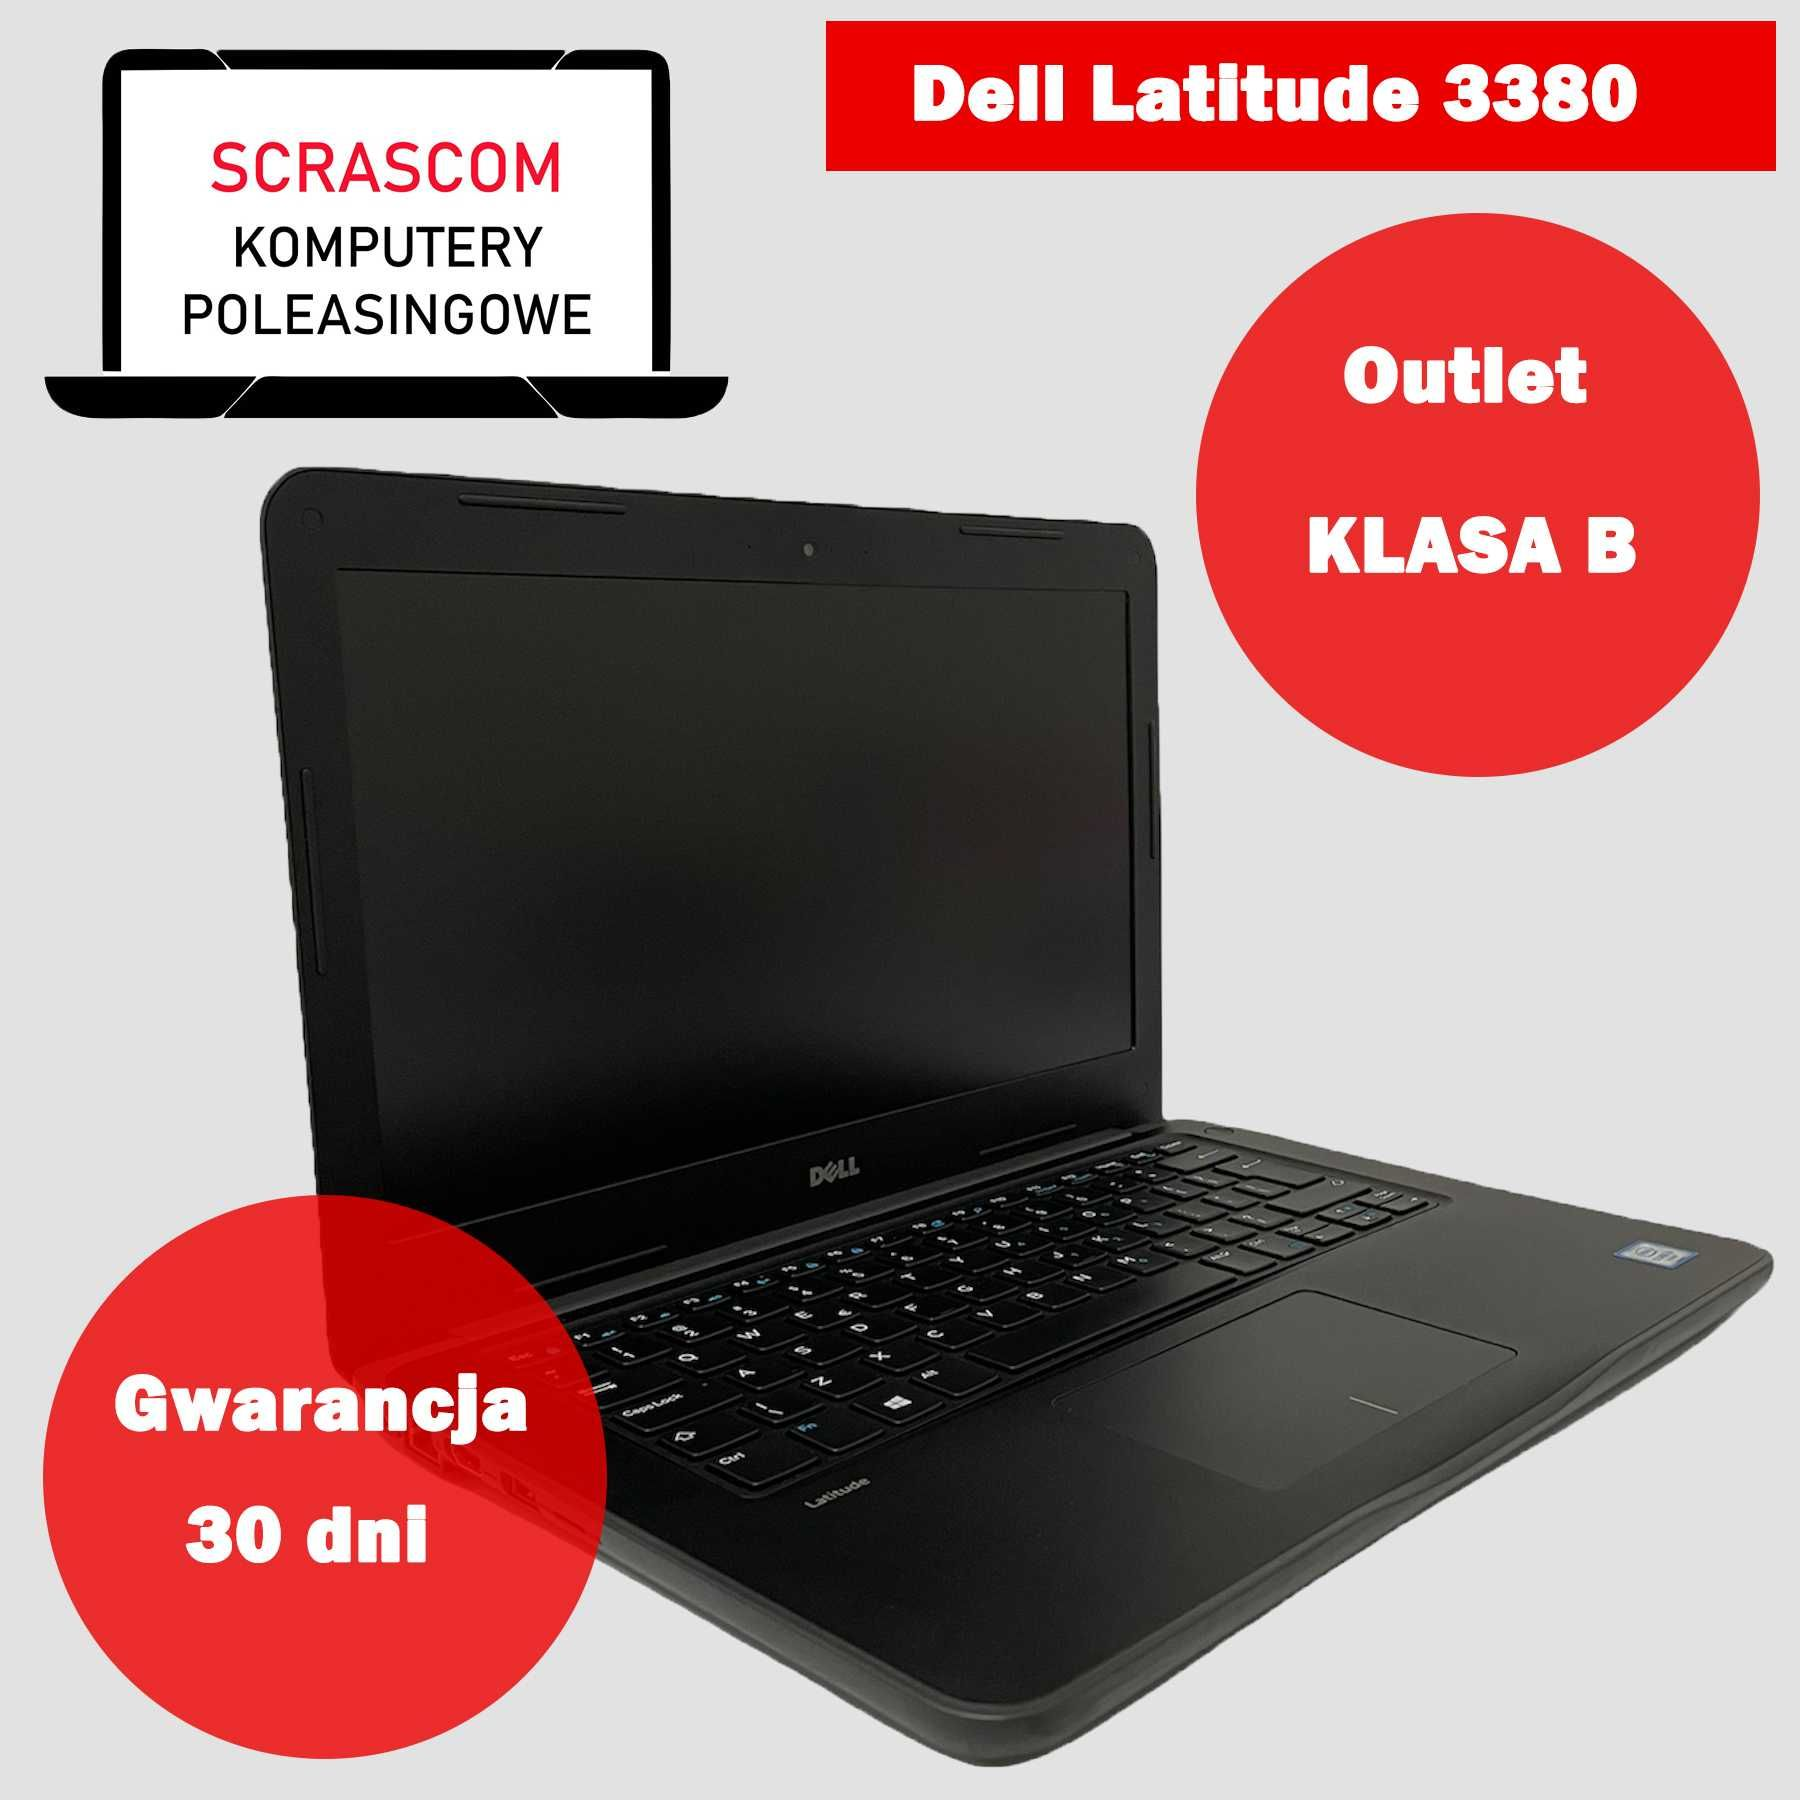 Laptop Dell Latitude 3380 i3 4GB 120GB SSD Intel Klasa B Gwarancja